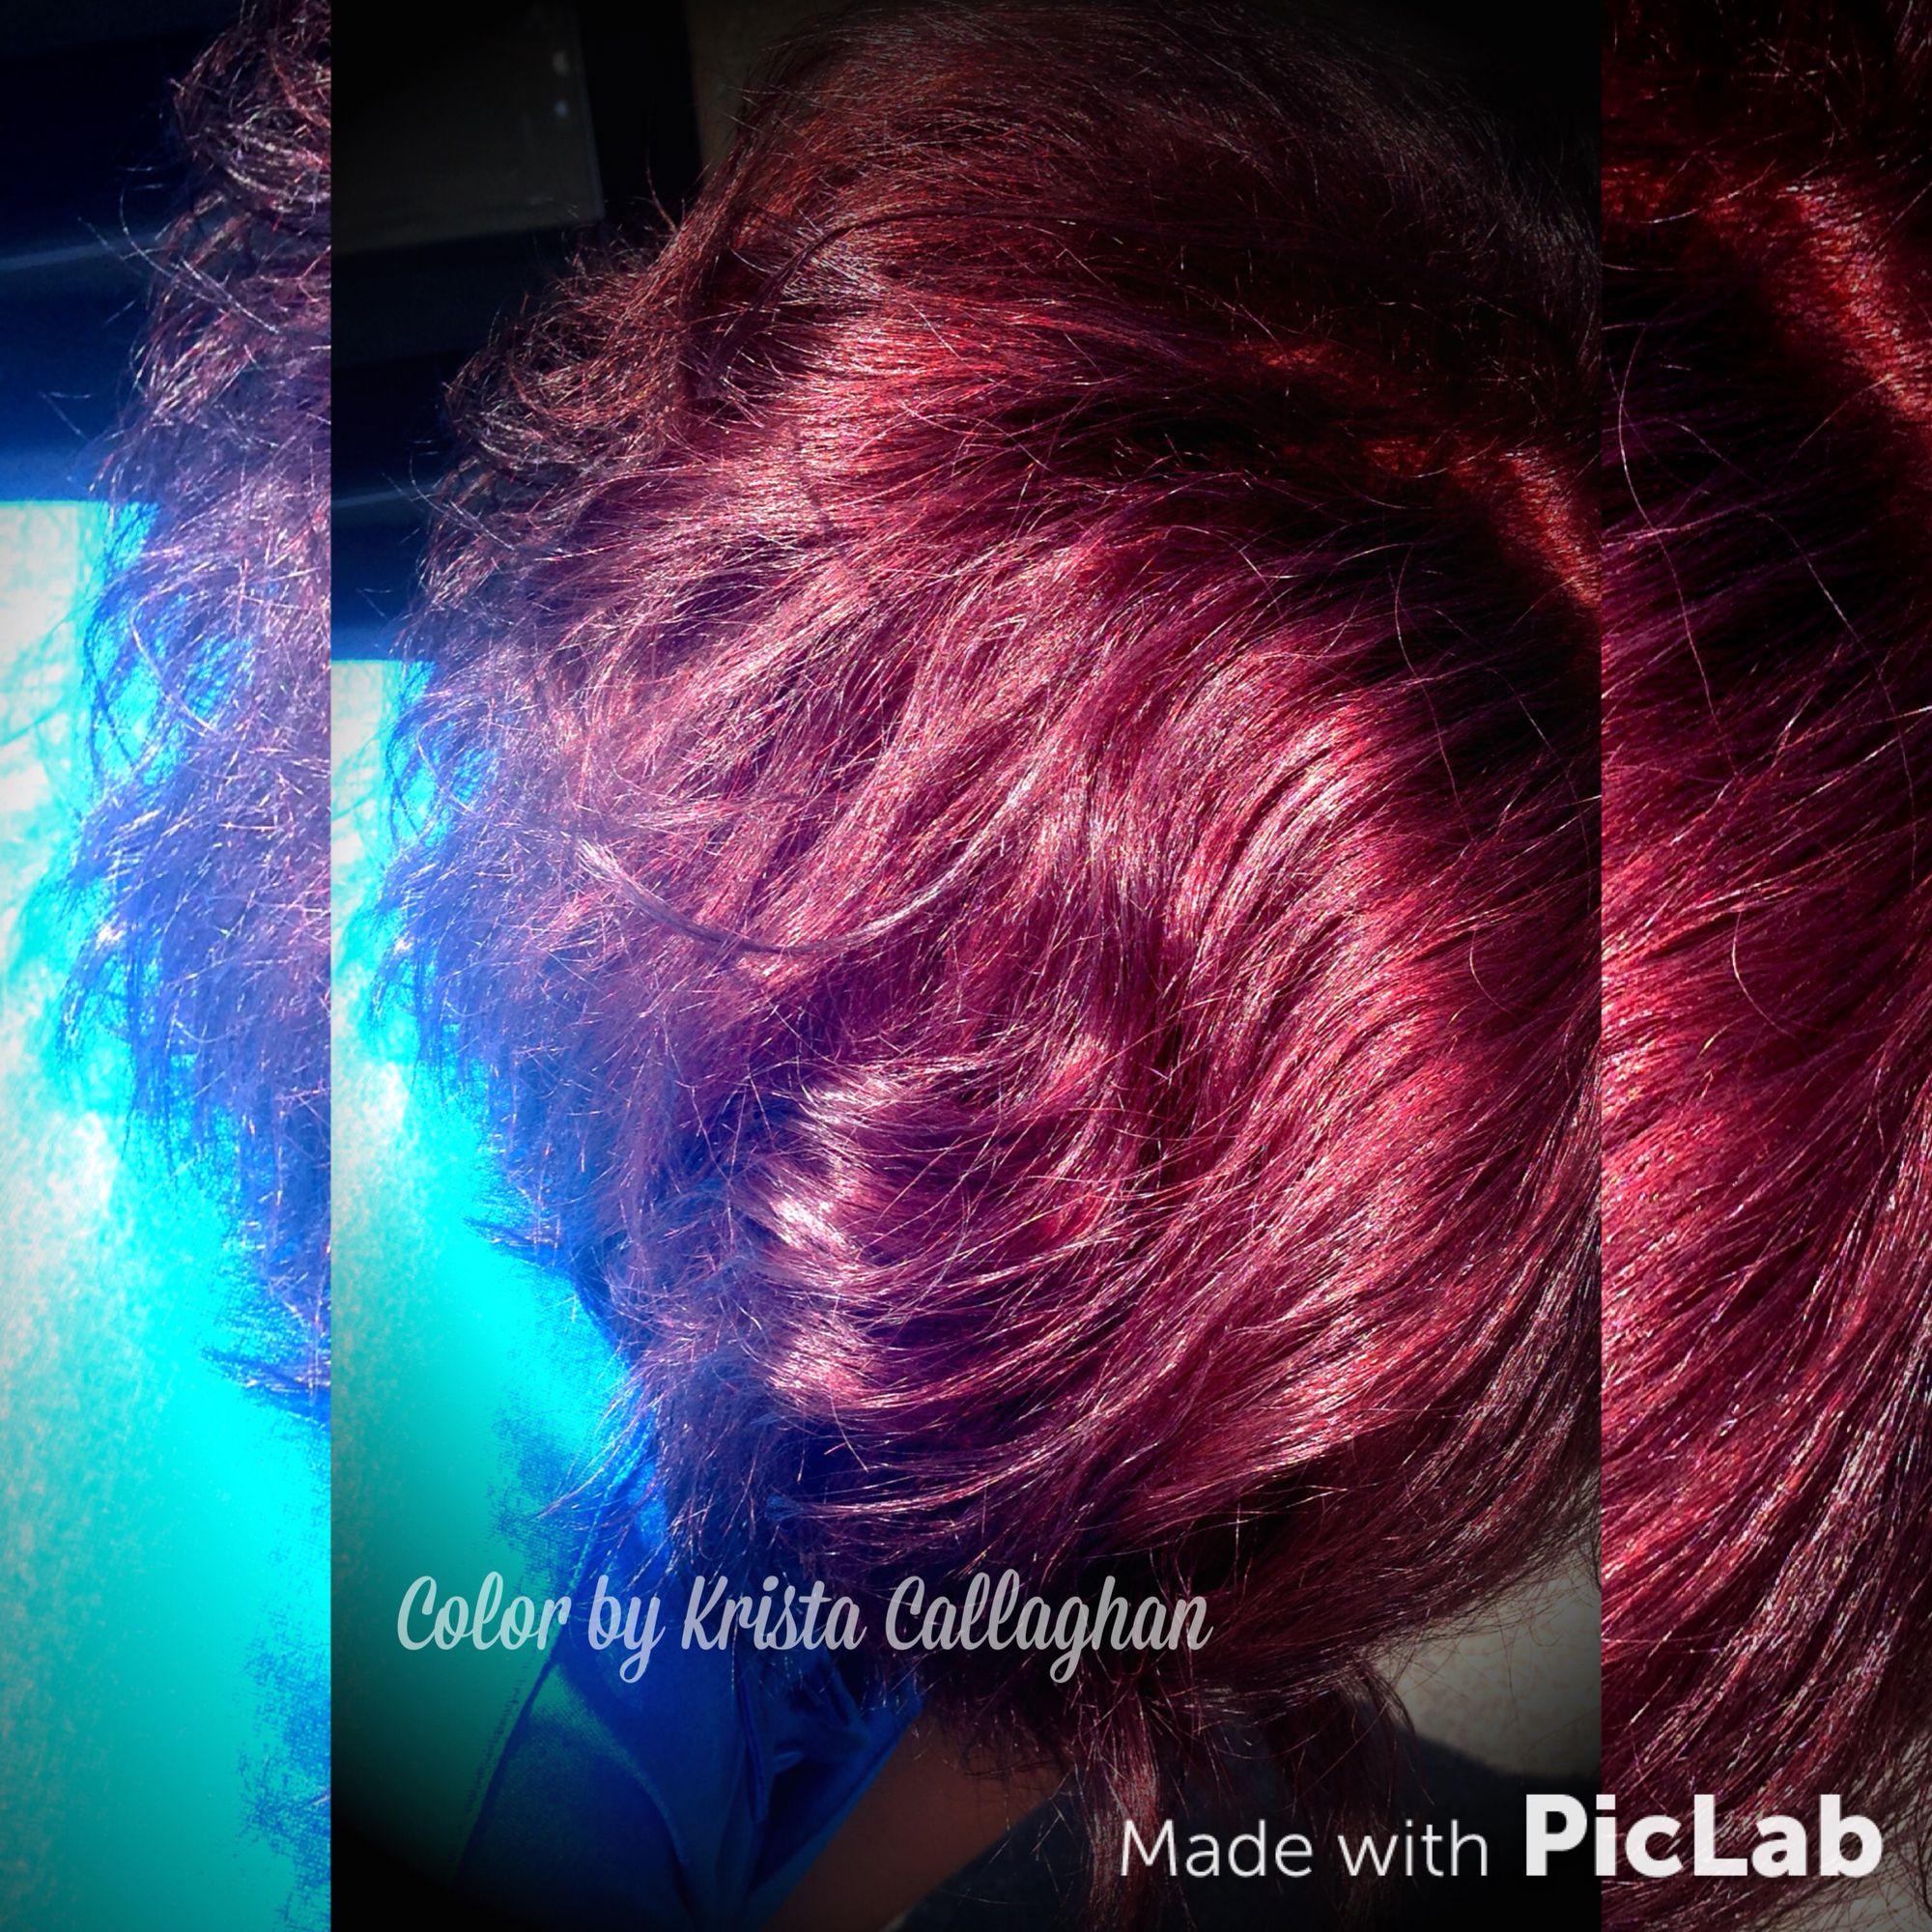 Red violet hair color, shiny color, short hair #sugarnspicesalon #hair #amazinghair #rusk #richhaircolor